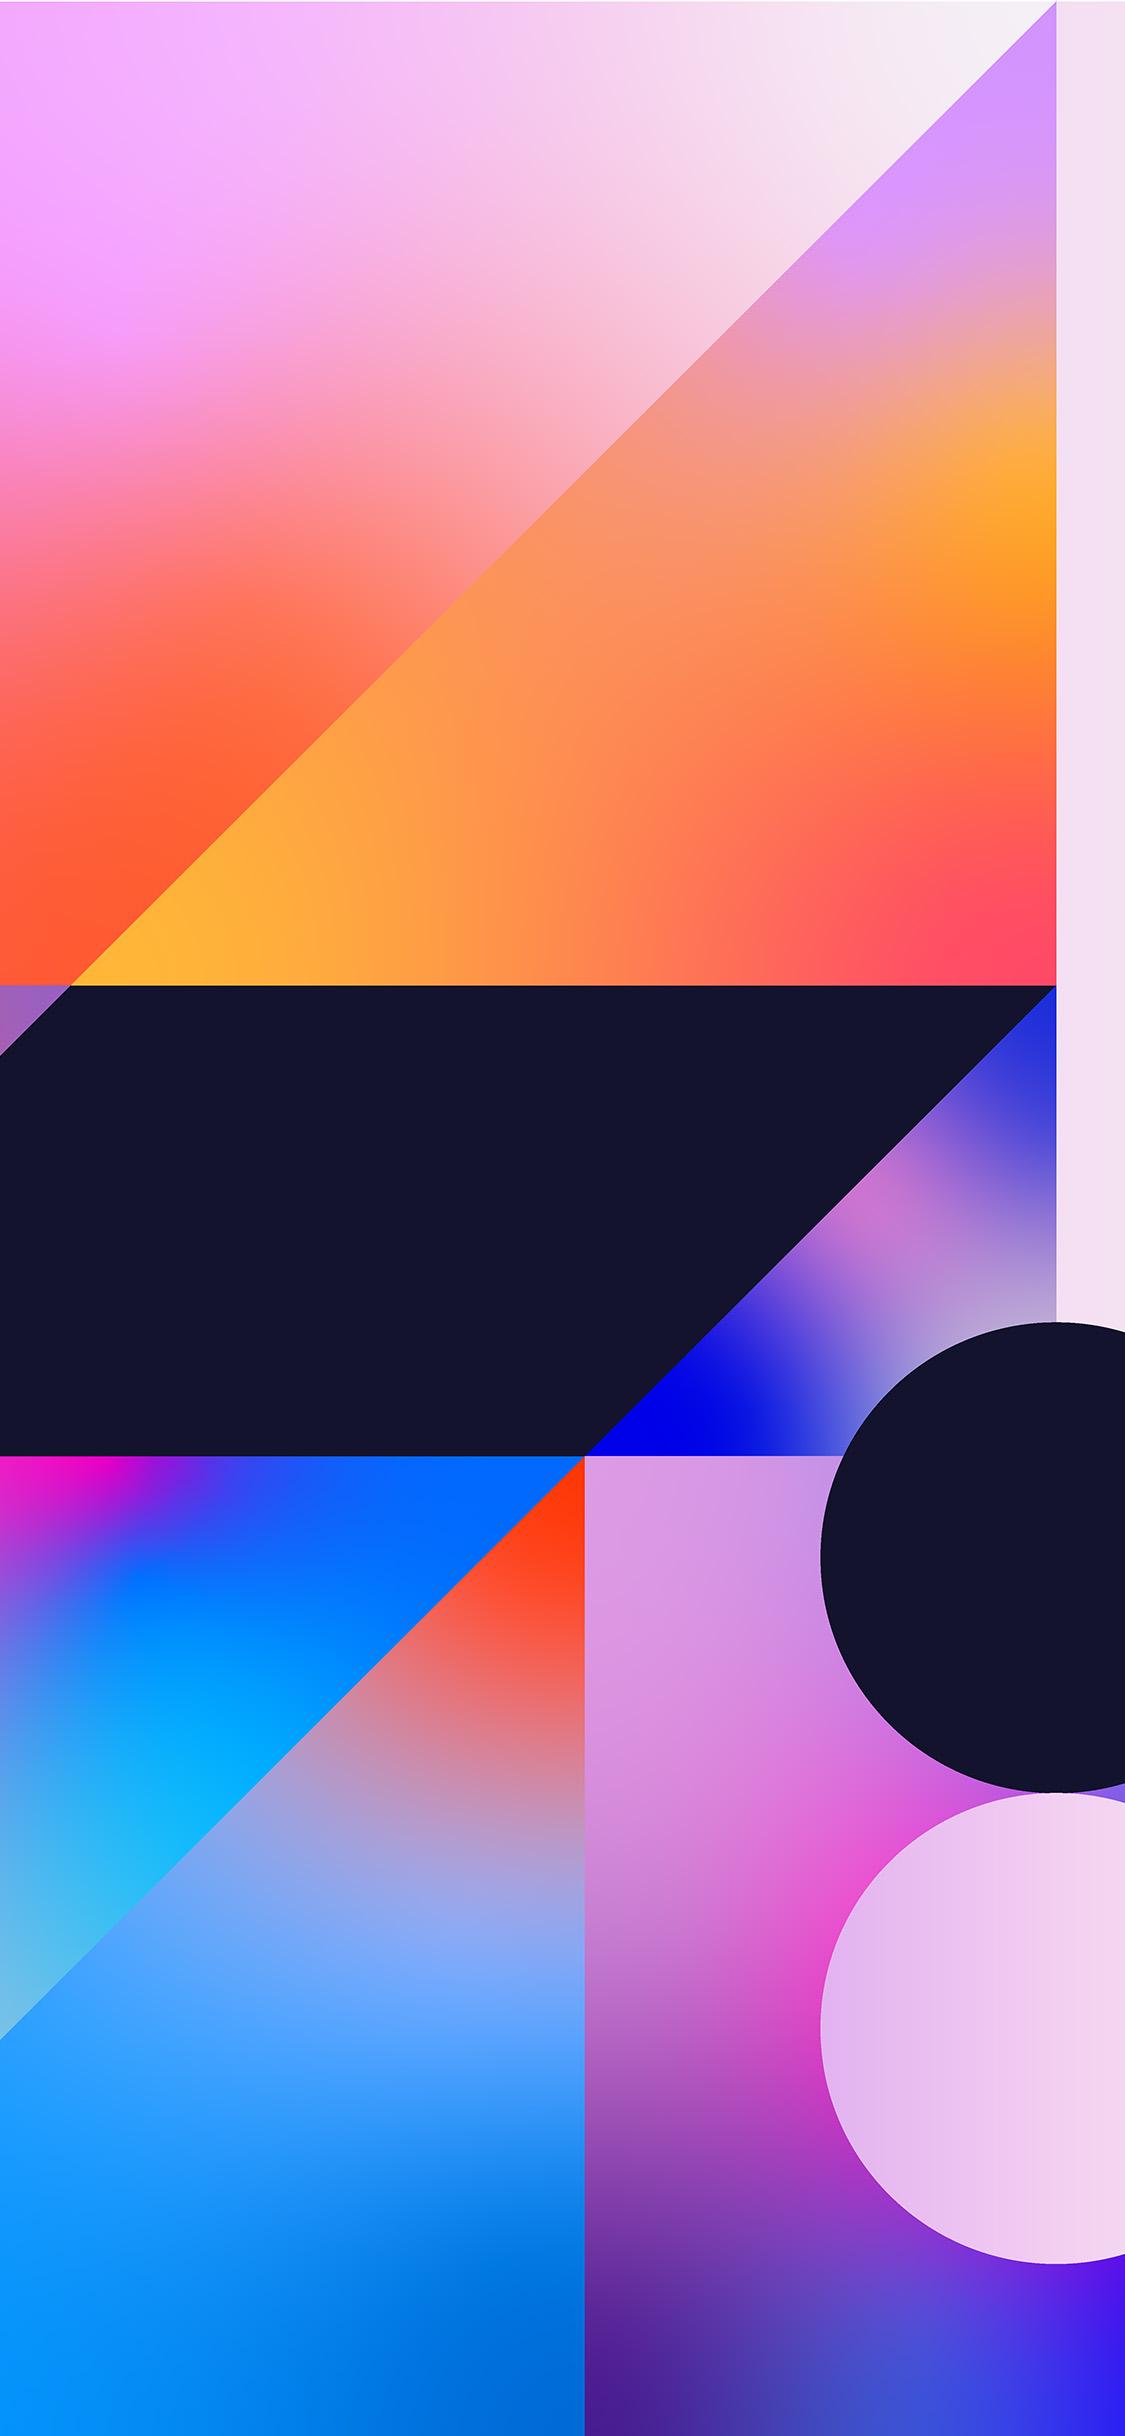 Wallpaper-029